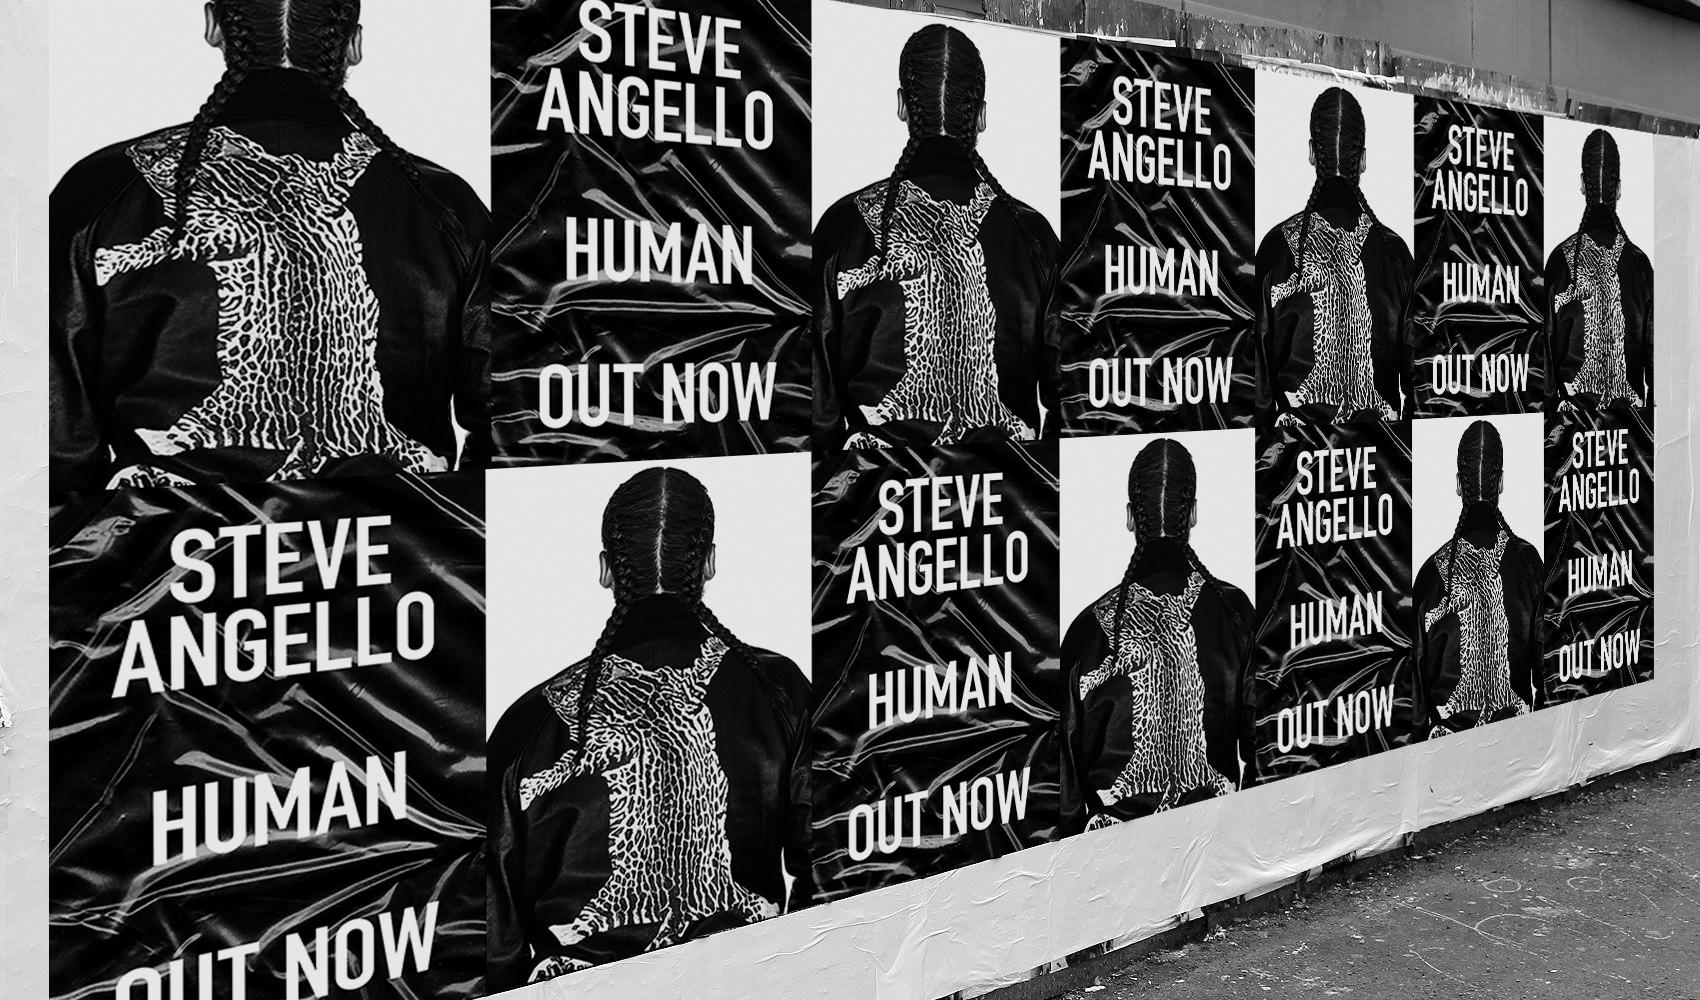 Human-Steve-angello